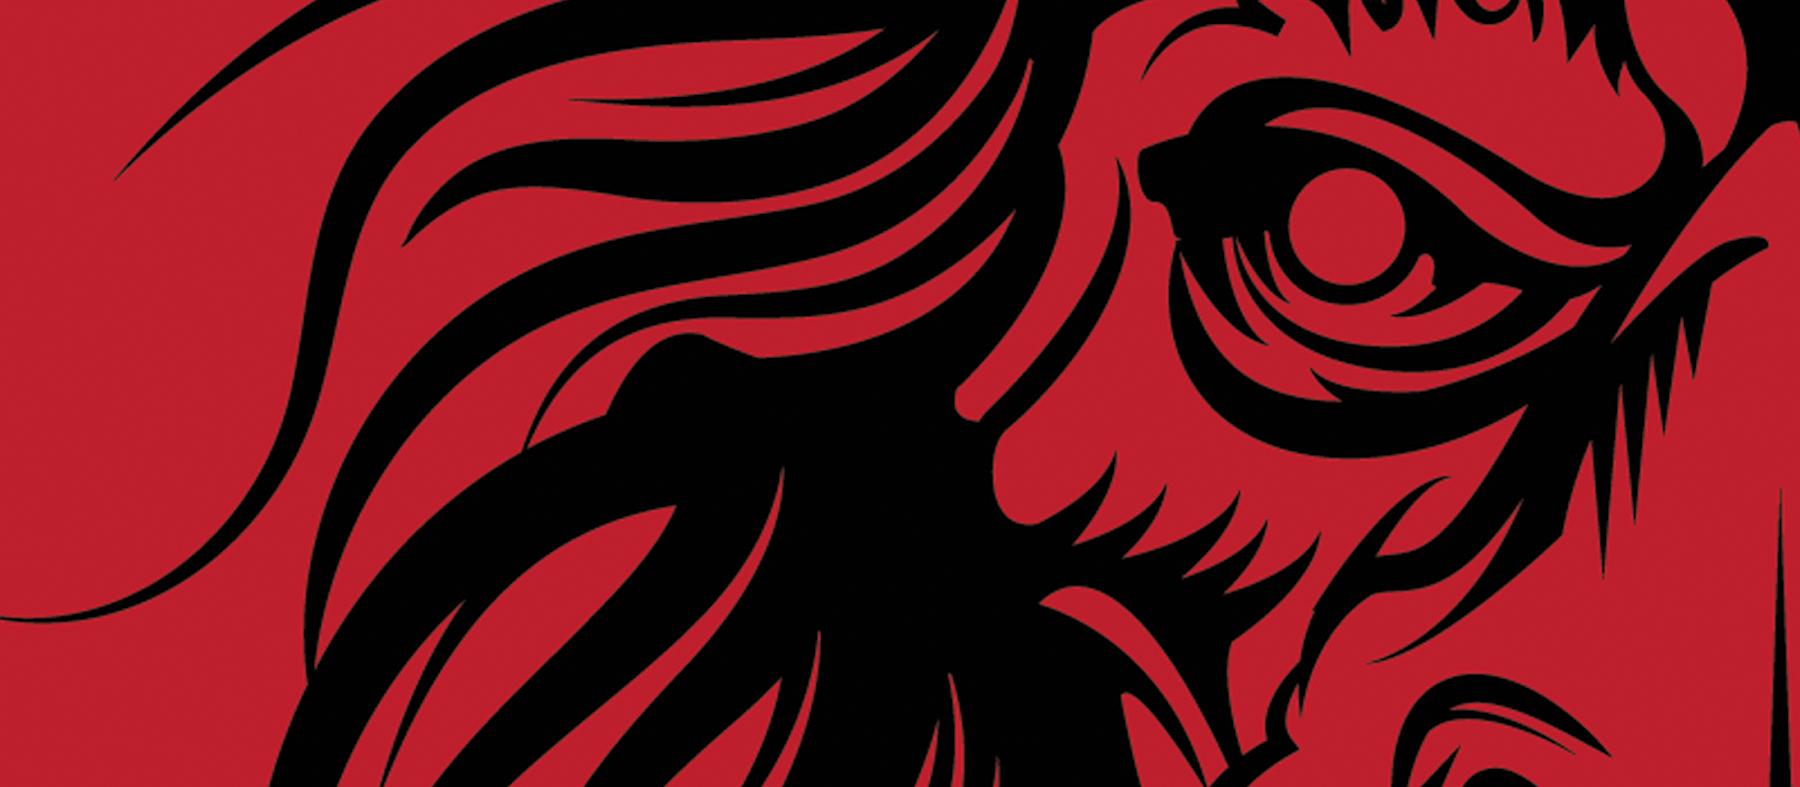 LION_illustration4.jpg